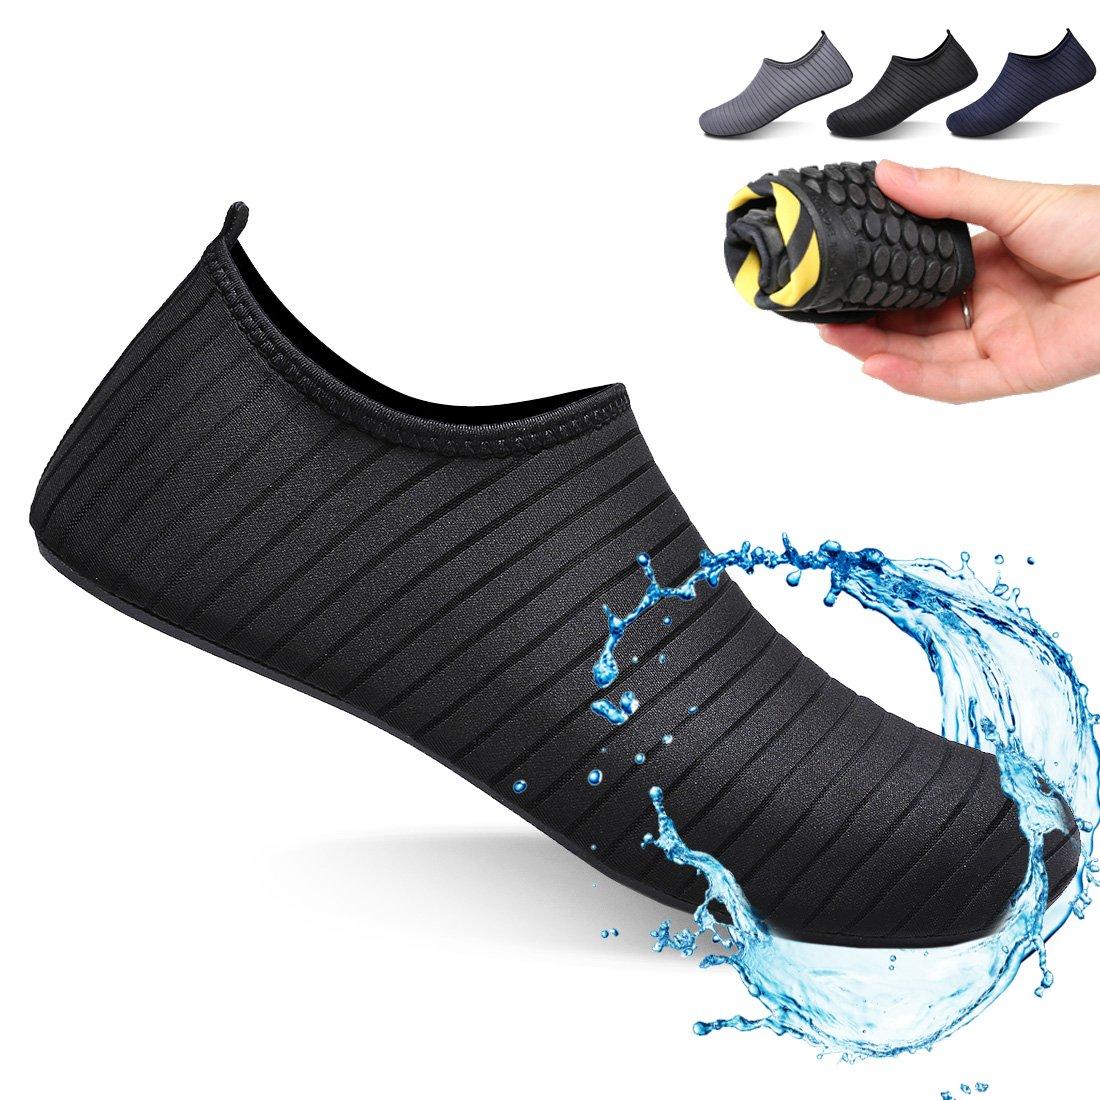 Ceyue Barefoot Water Shoes Breathable Water Sport Shoes Non-Slip Aqua Socks Beach Sandals for Men Women Black 45/46